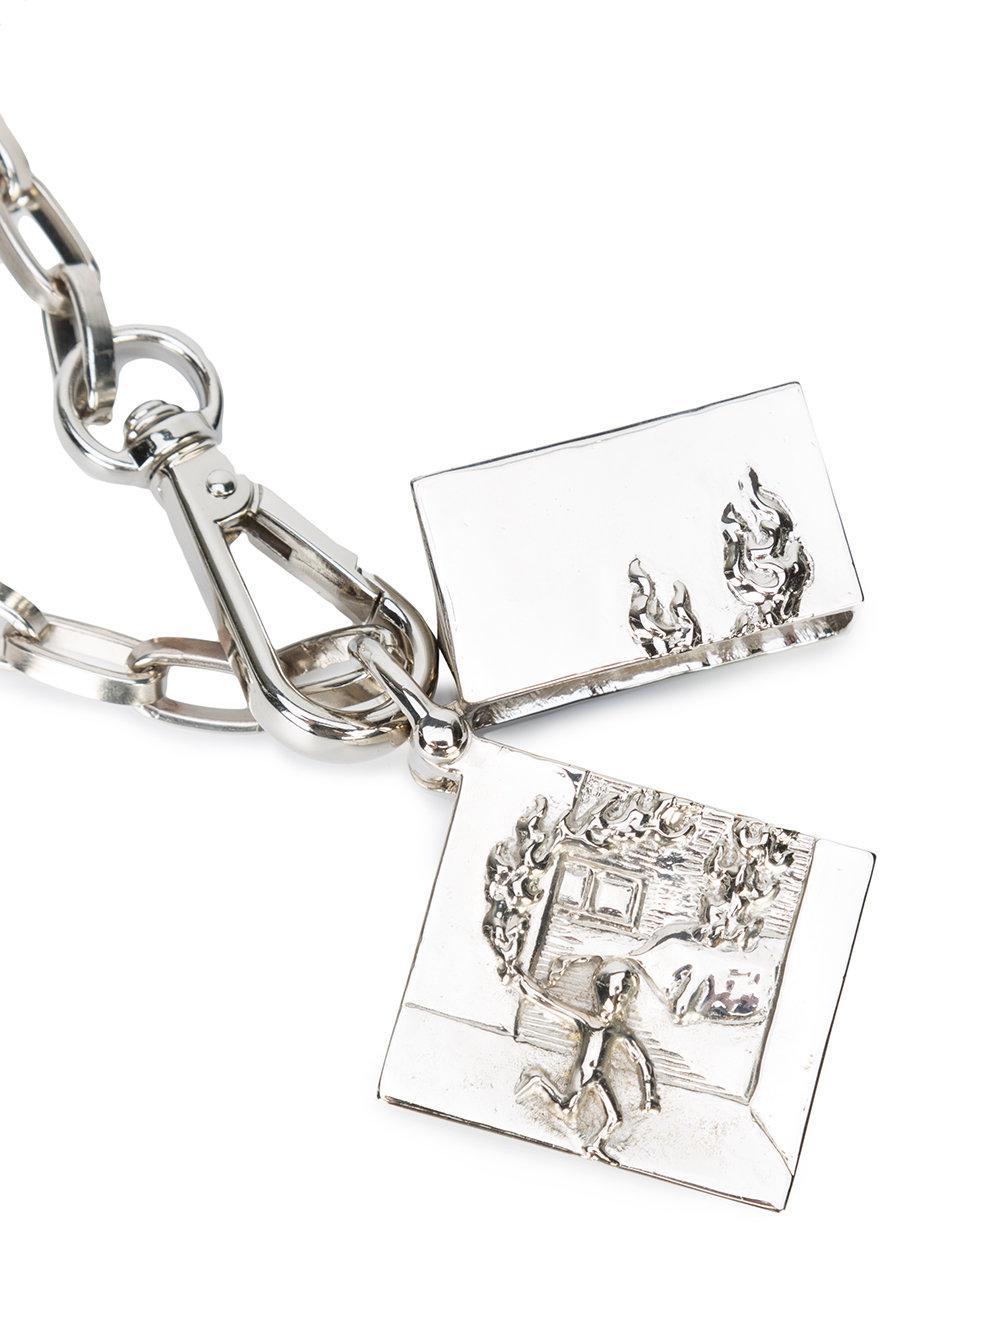 Enfants Riches Deprimes lighter with chain - Metallic wCikE4Ft